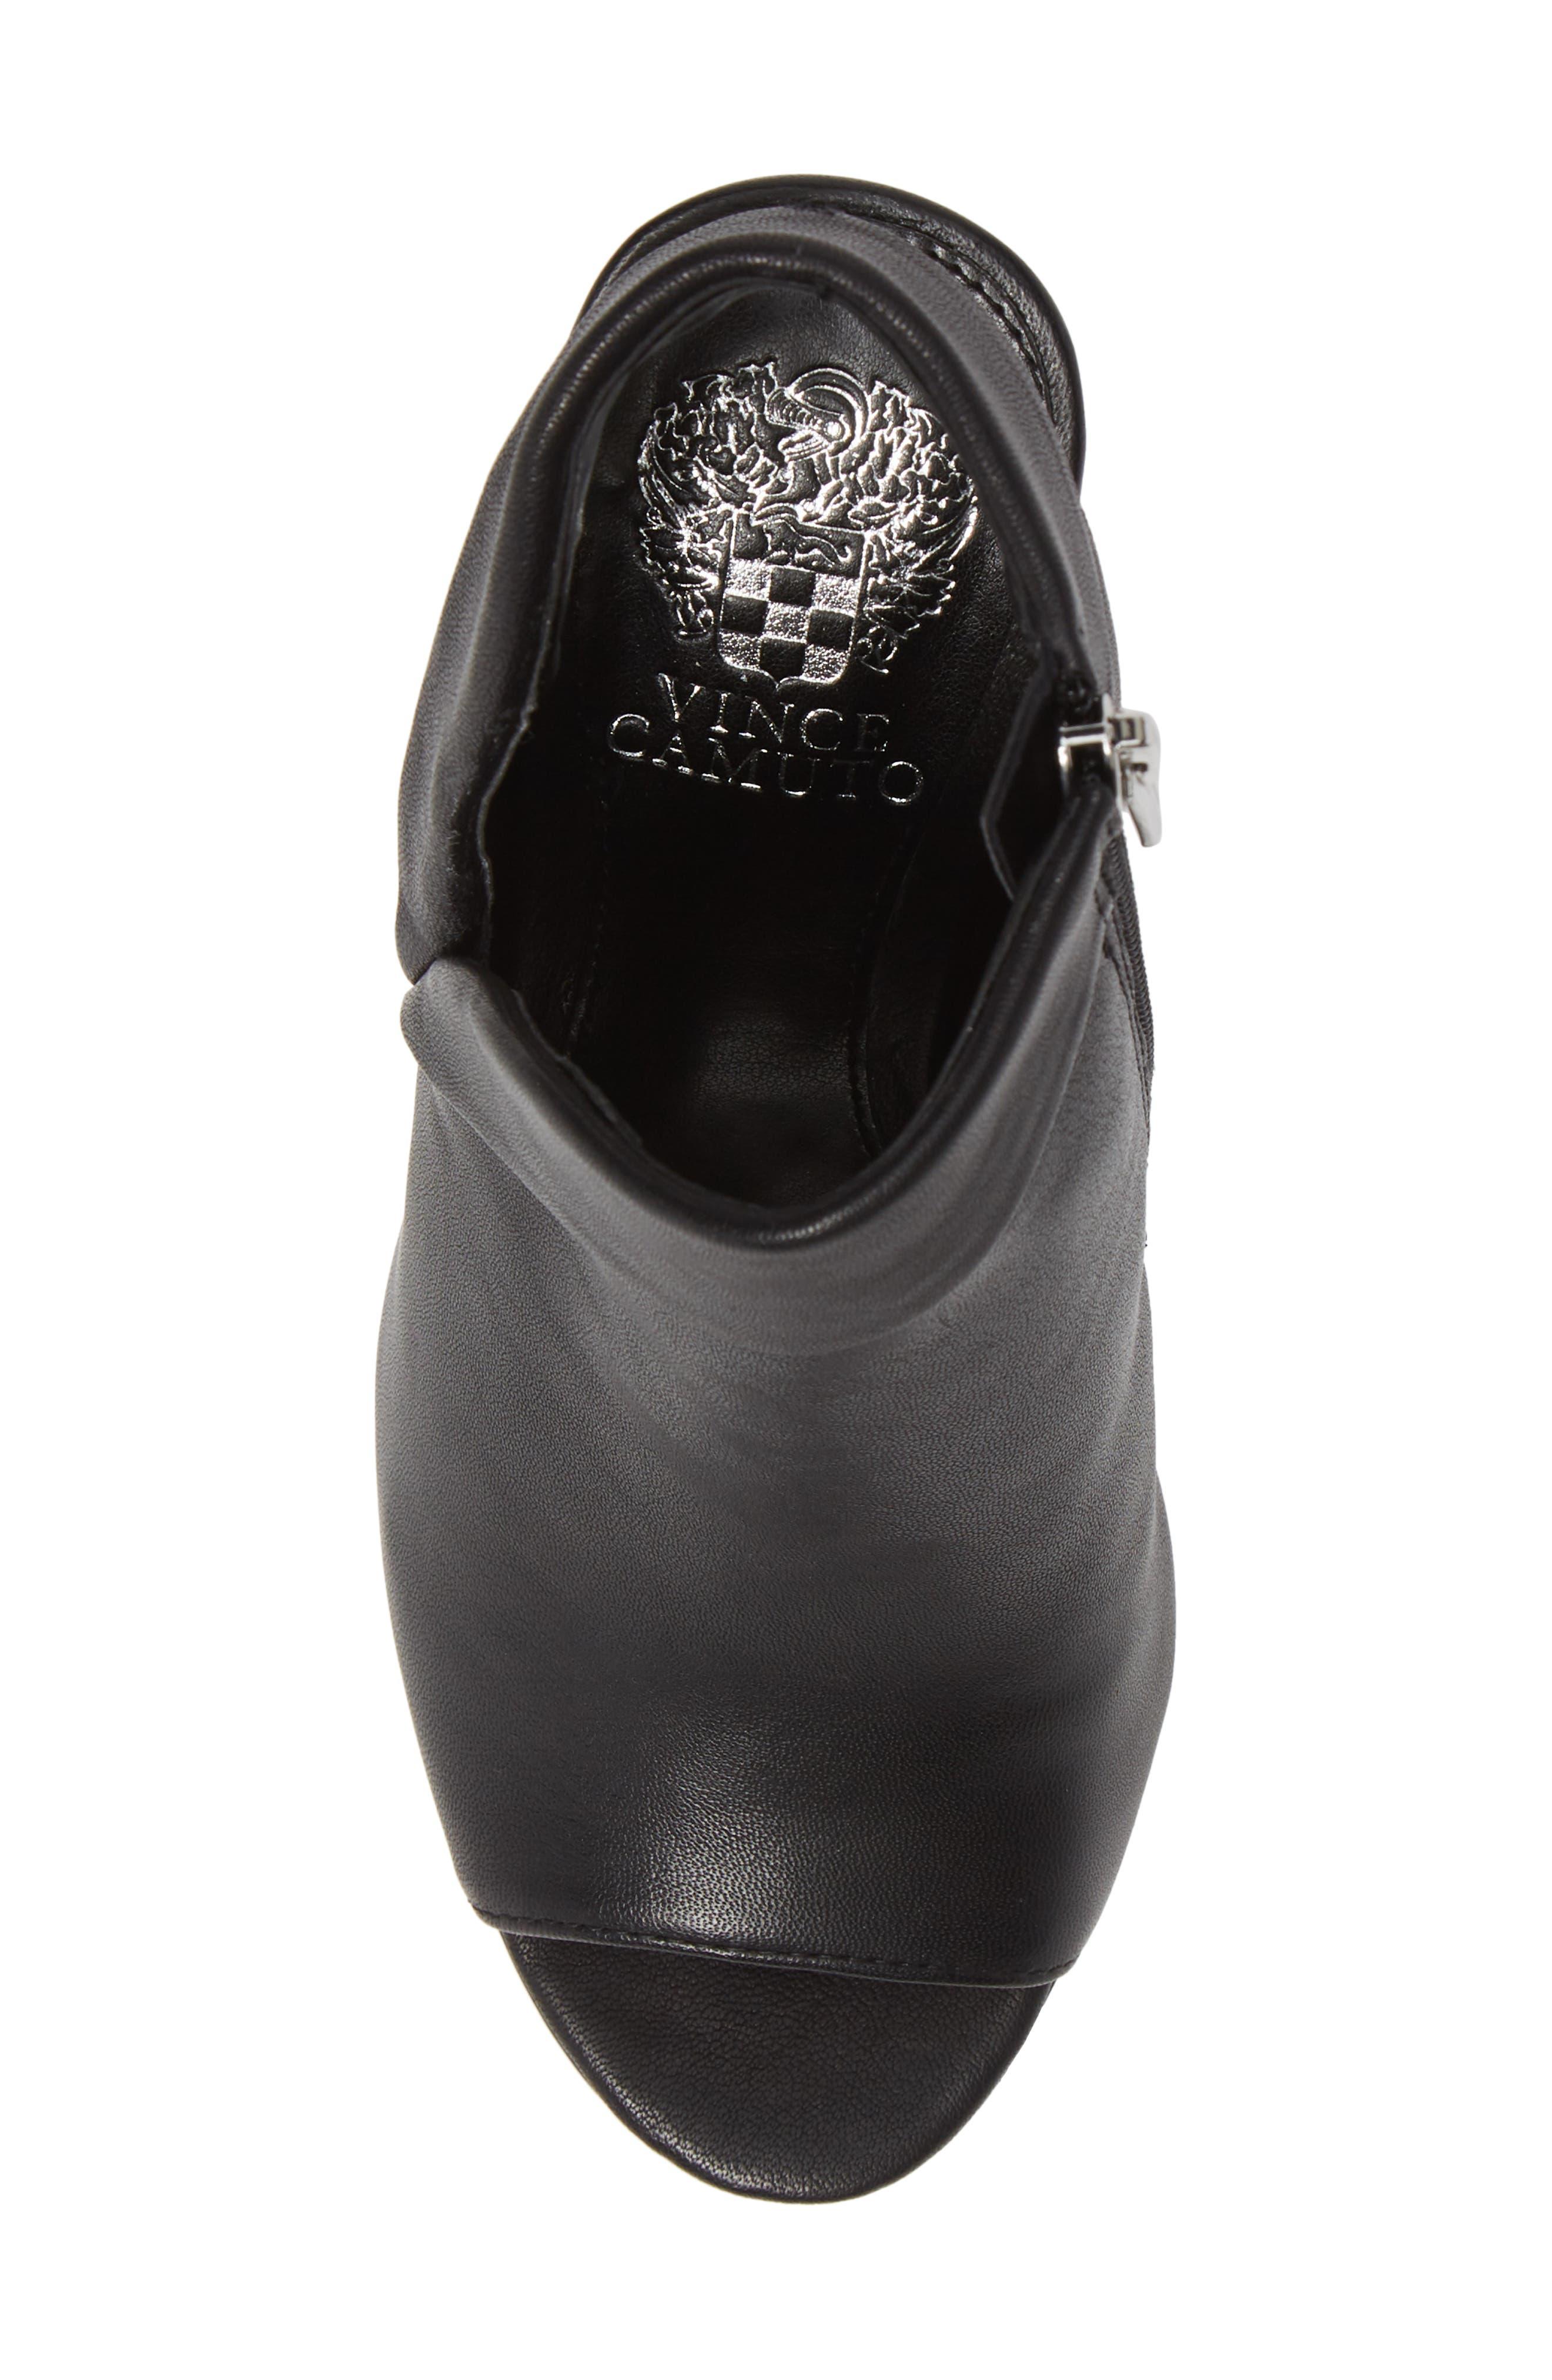 Cholia Asymmetrical Sandal Bootie,                             Alternate thumbnail 5, color,                             BLACK LEATHER